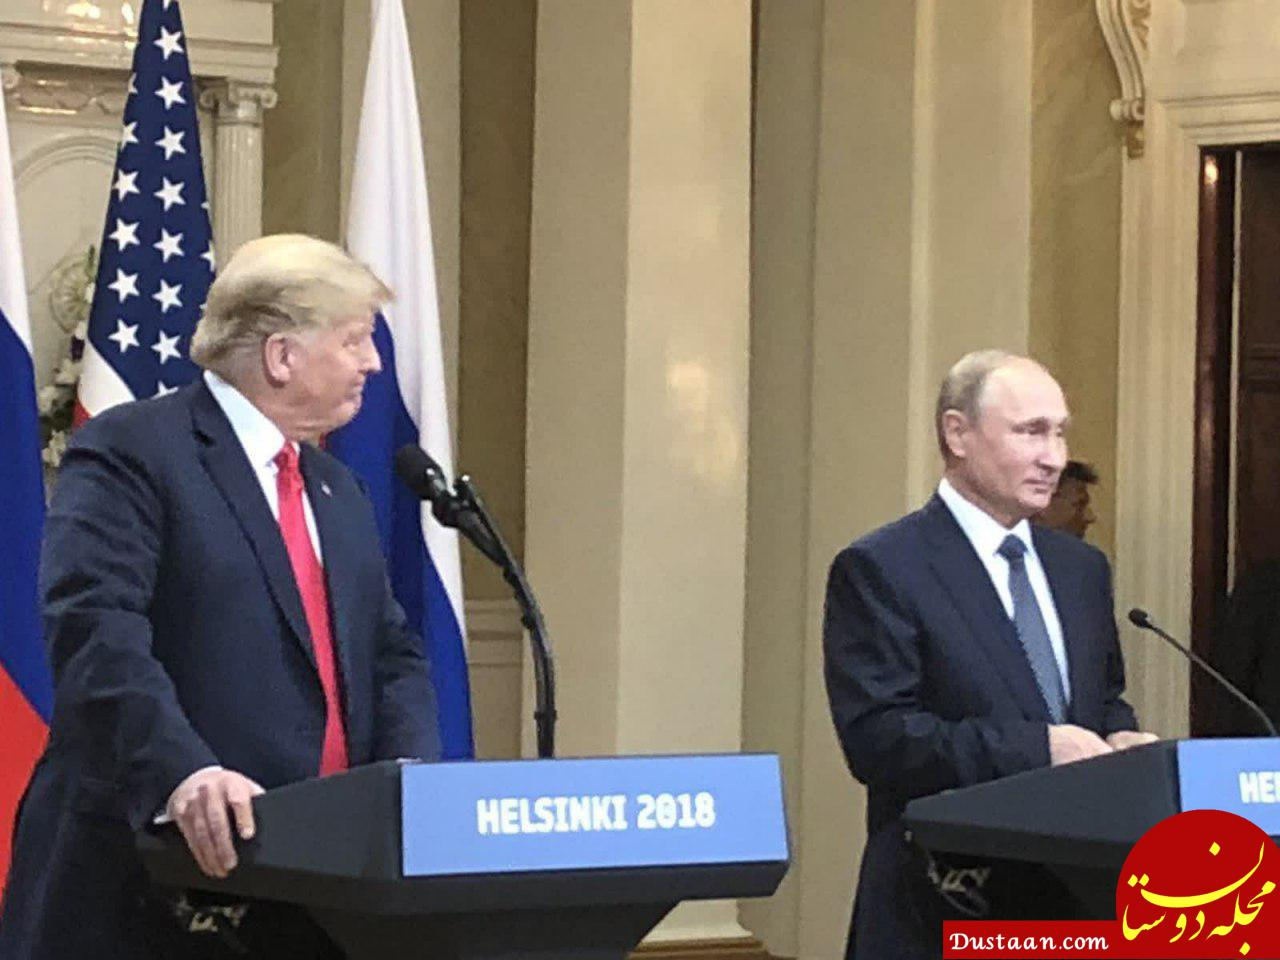 www.dustaan.com پوتین: مدرکی برای دخالت در انتخابات آمریکا وجود ندارد